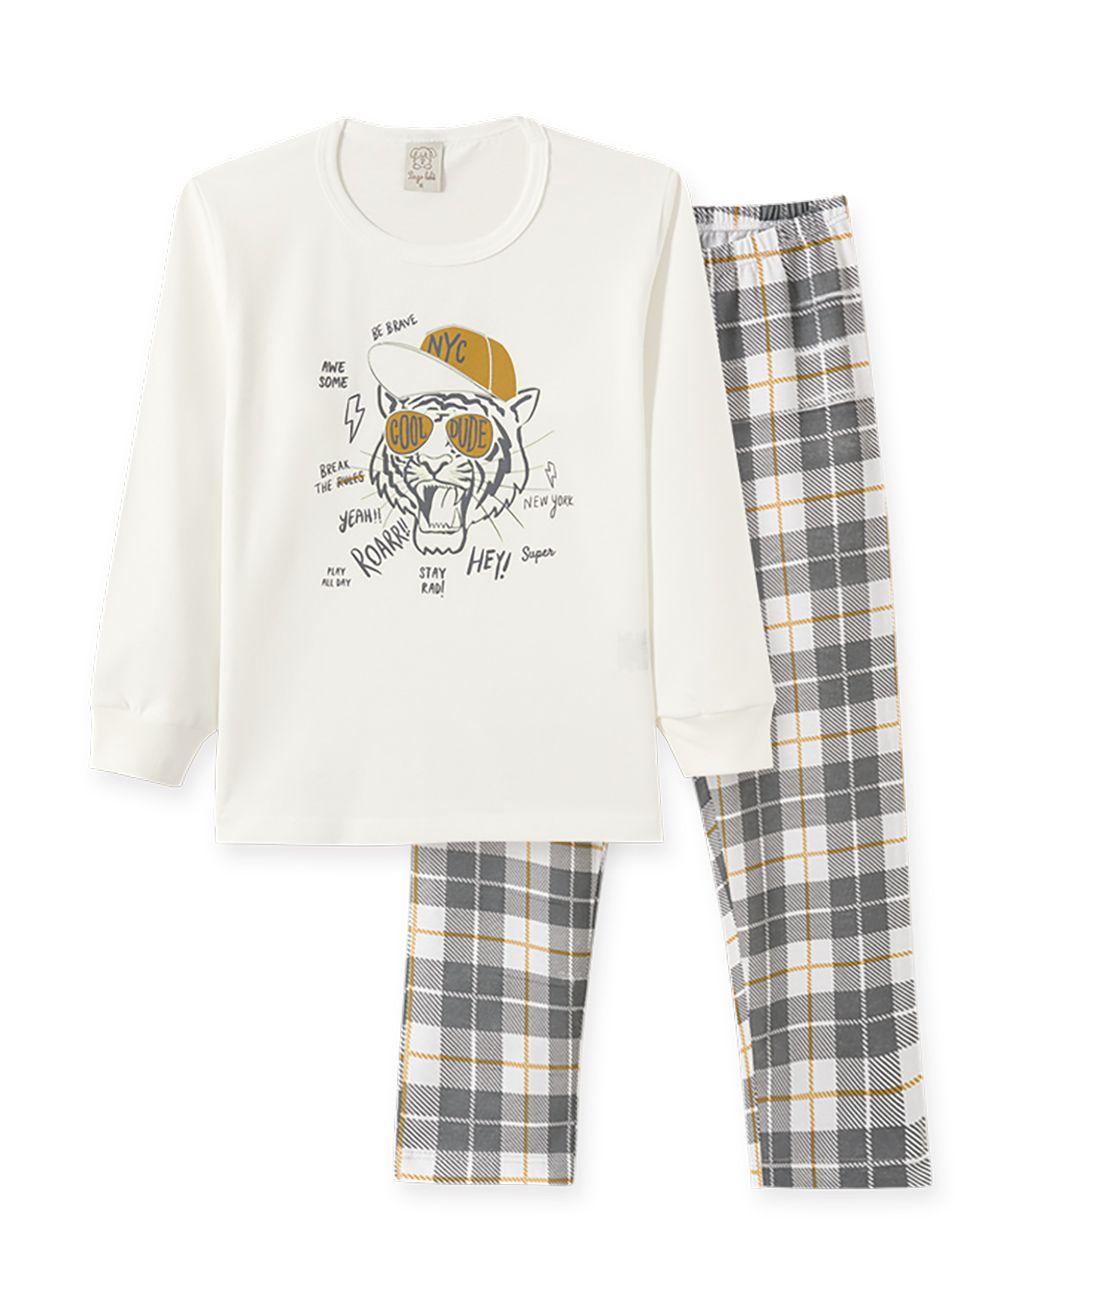 Pijama Infantil manga longa em meia malha penteada Pingo Lelê  Tigre  Off White e Xadrez / Brilha no escuro